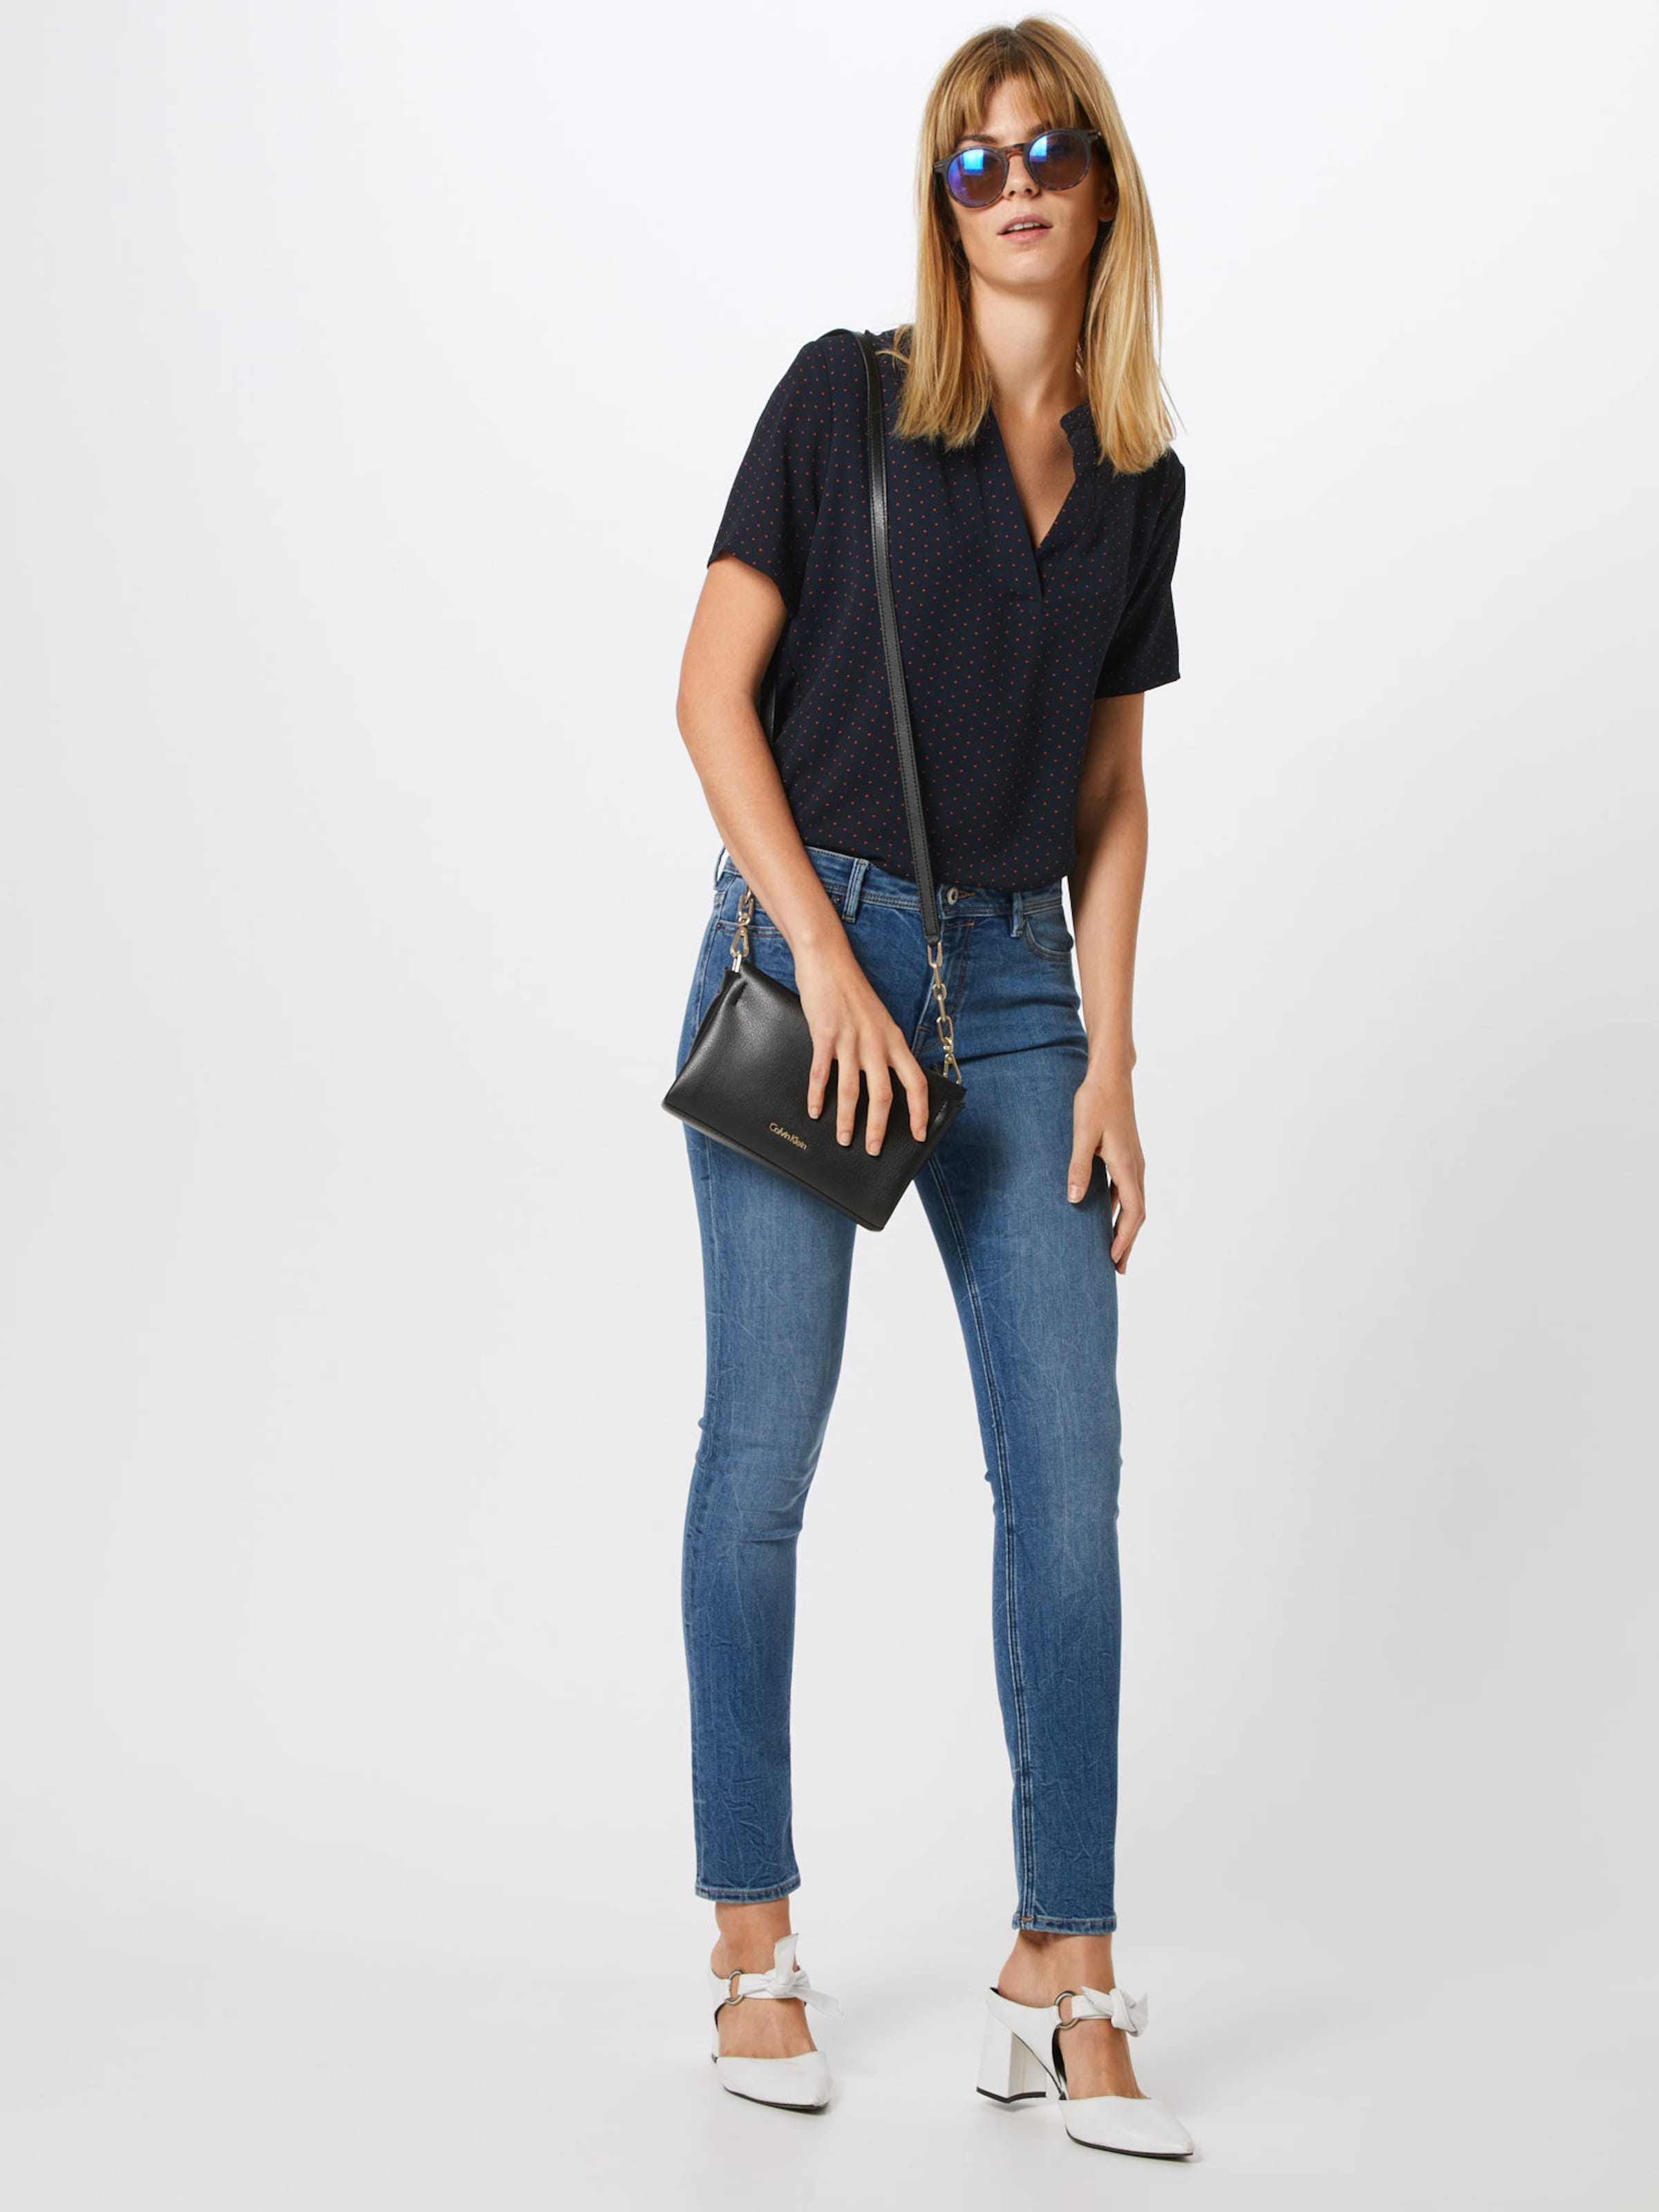 Denim Jean Denim' By Bleu En Lr Pants Esprit 'rcs Edc Slim nN80wOmv